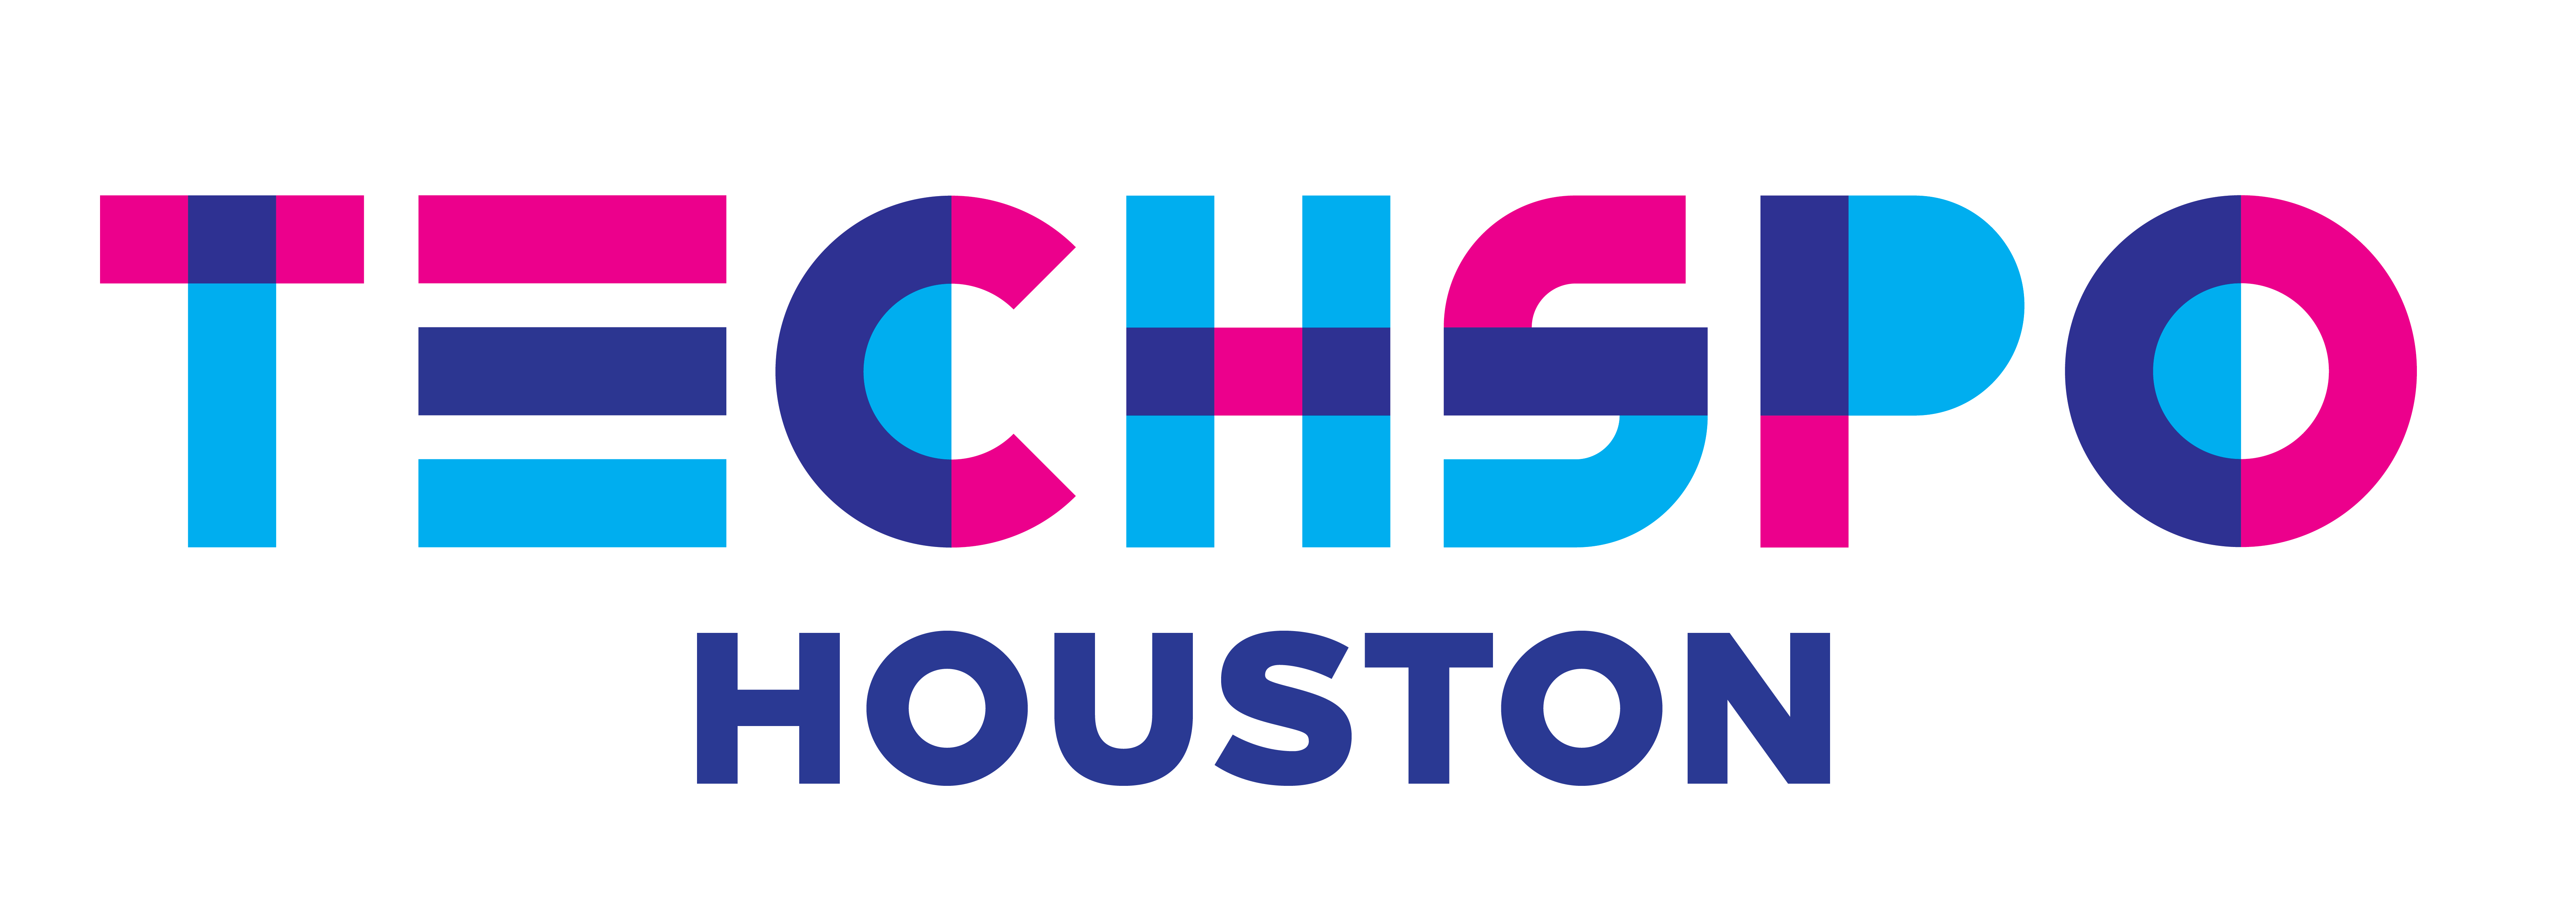 TECHSPO Houston 2022 Technology Expo (Internet ~ Mobile ~ AdTech ~ MarTech ~ SaaS)